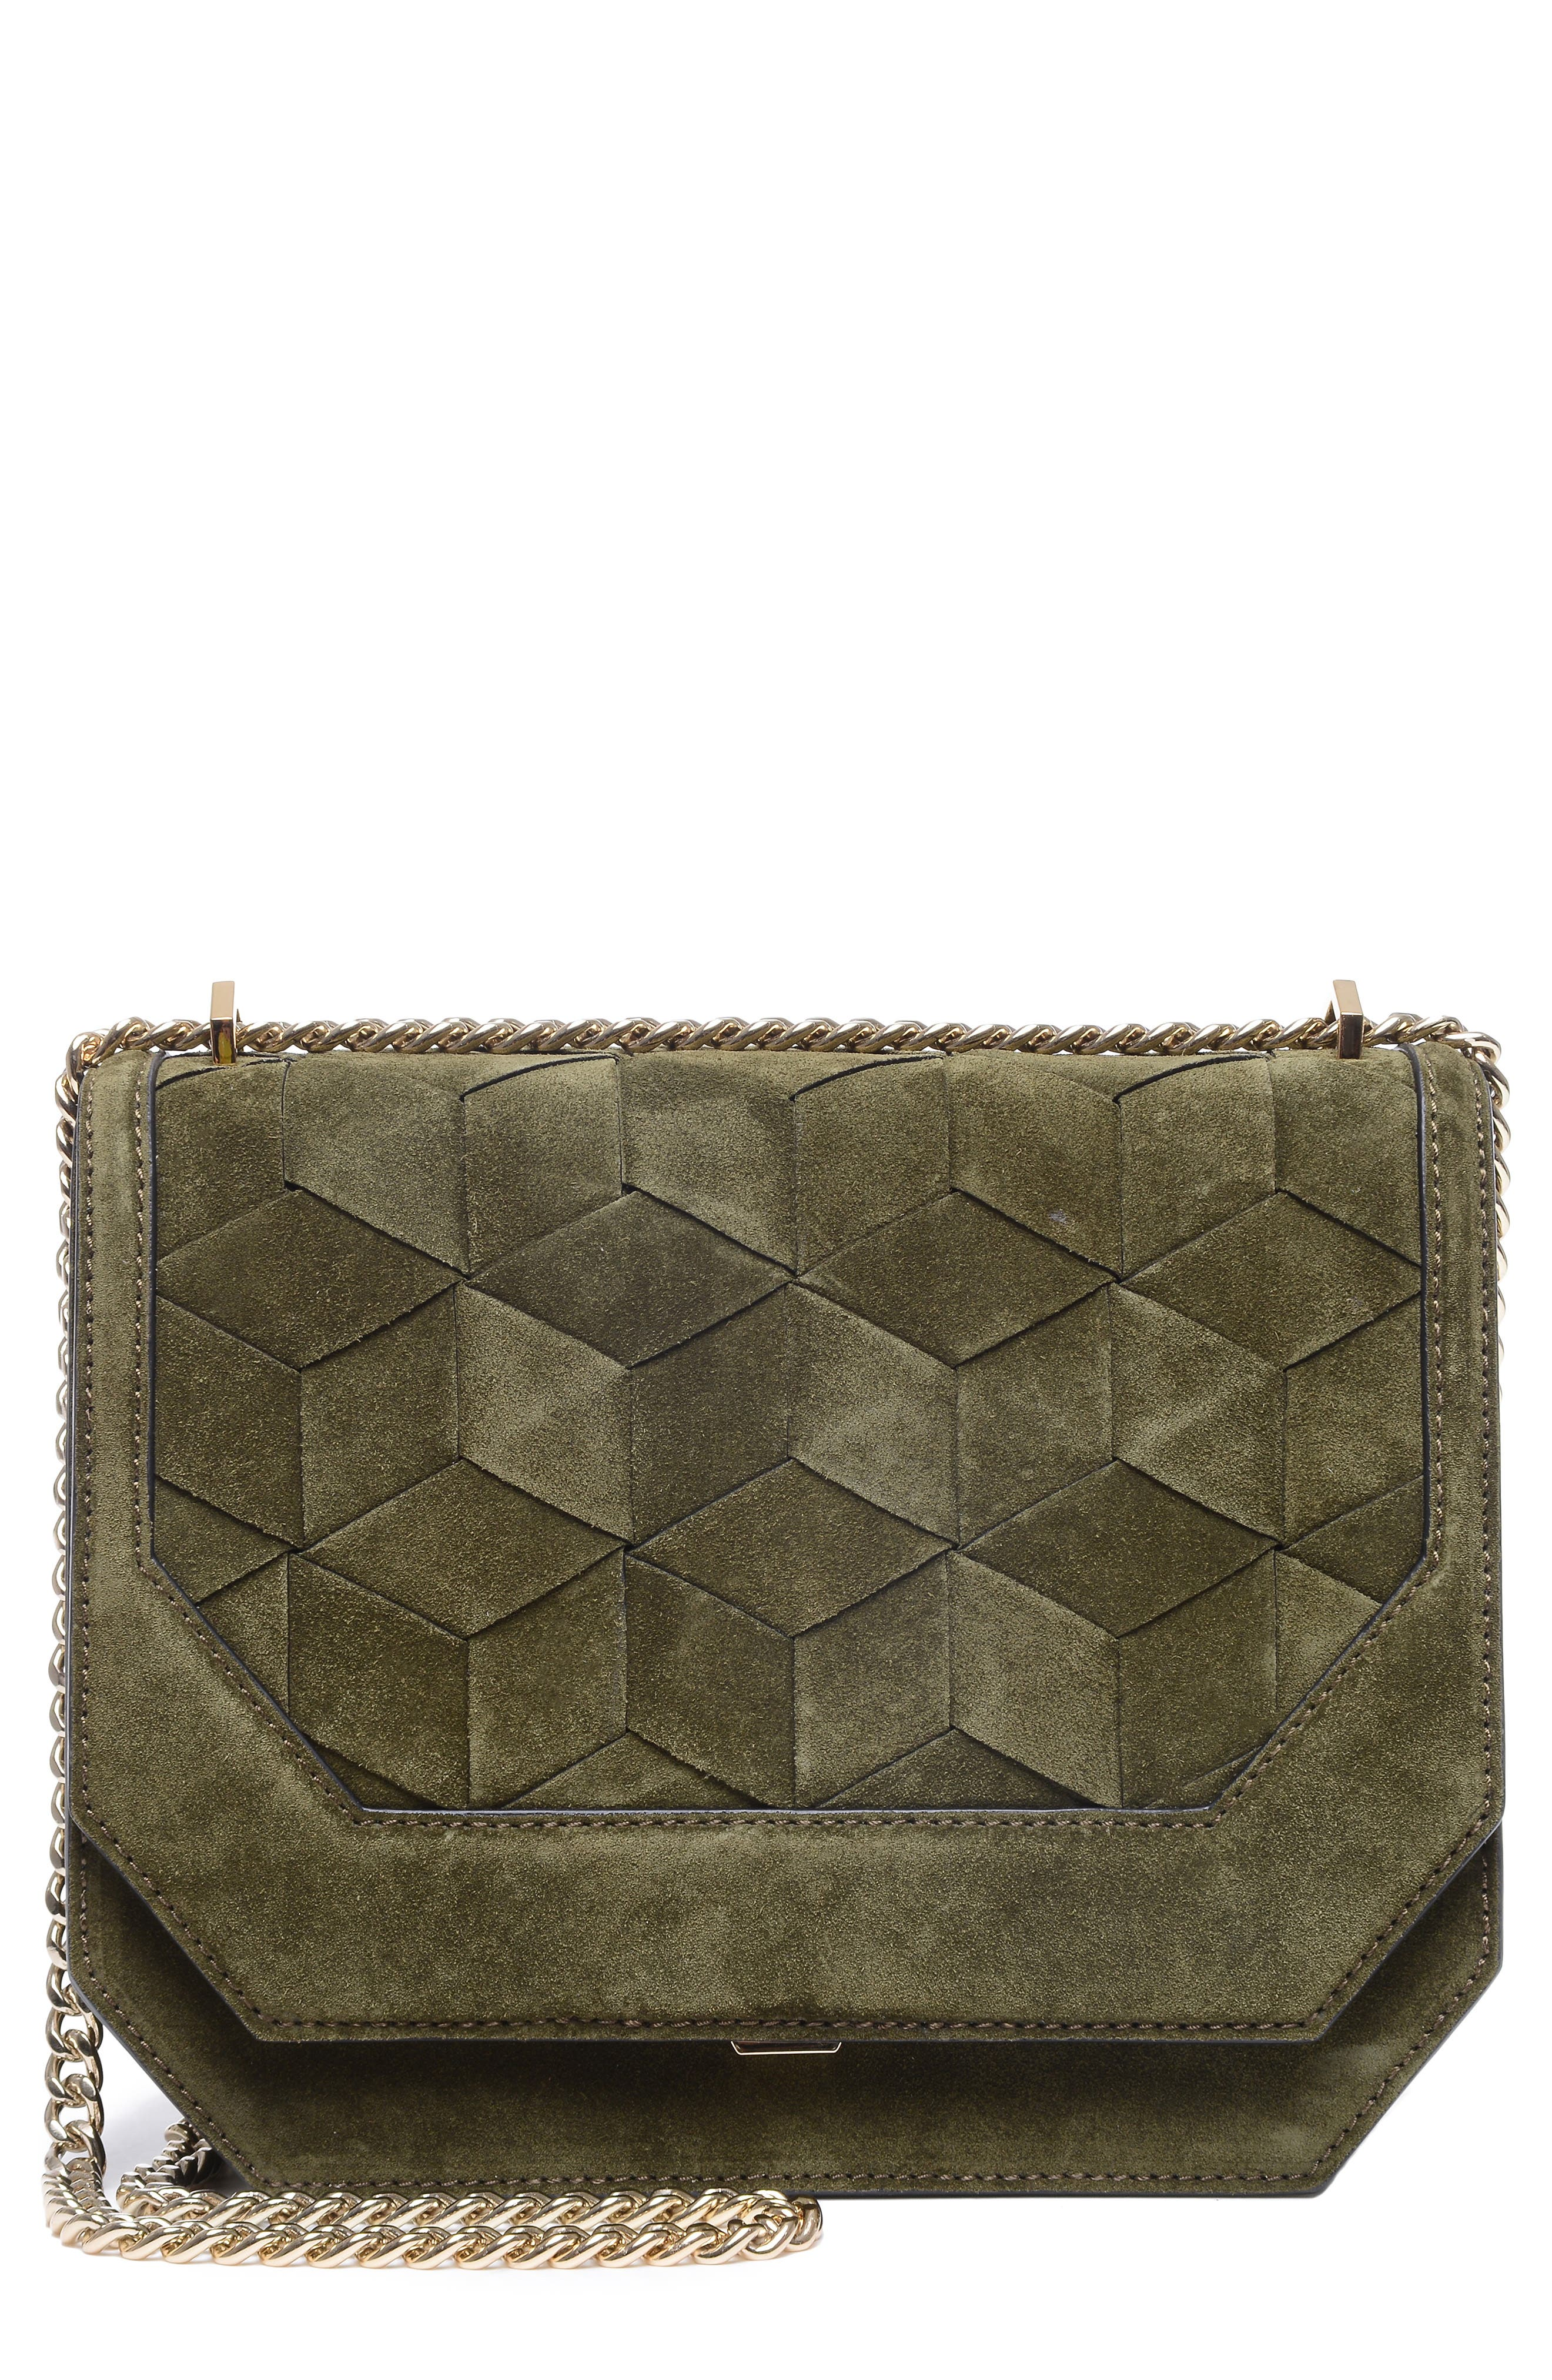 Supine Suede Shoulder Bag,                             Main thumbnail 1, color,                             300